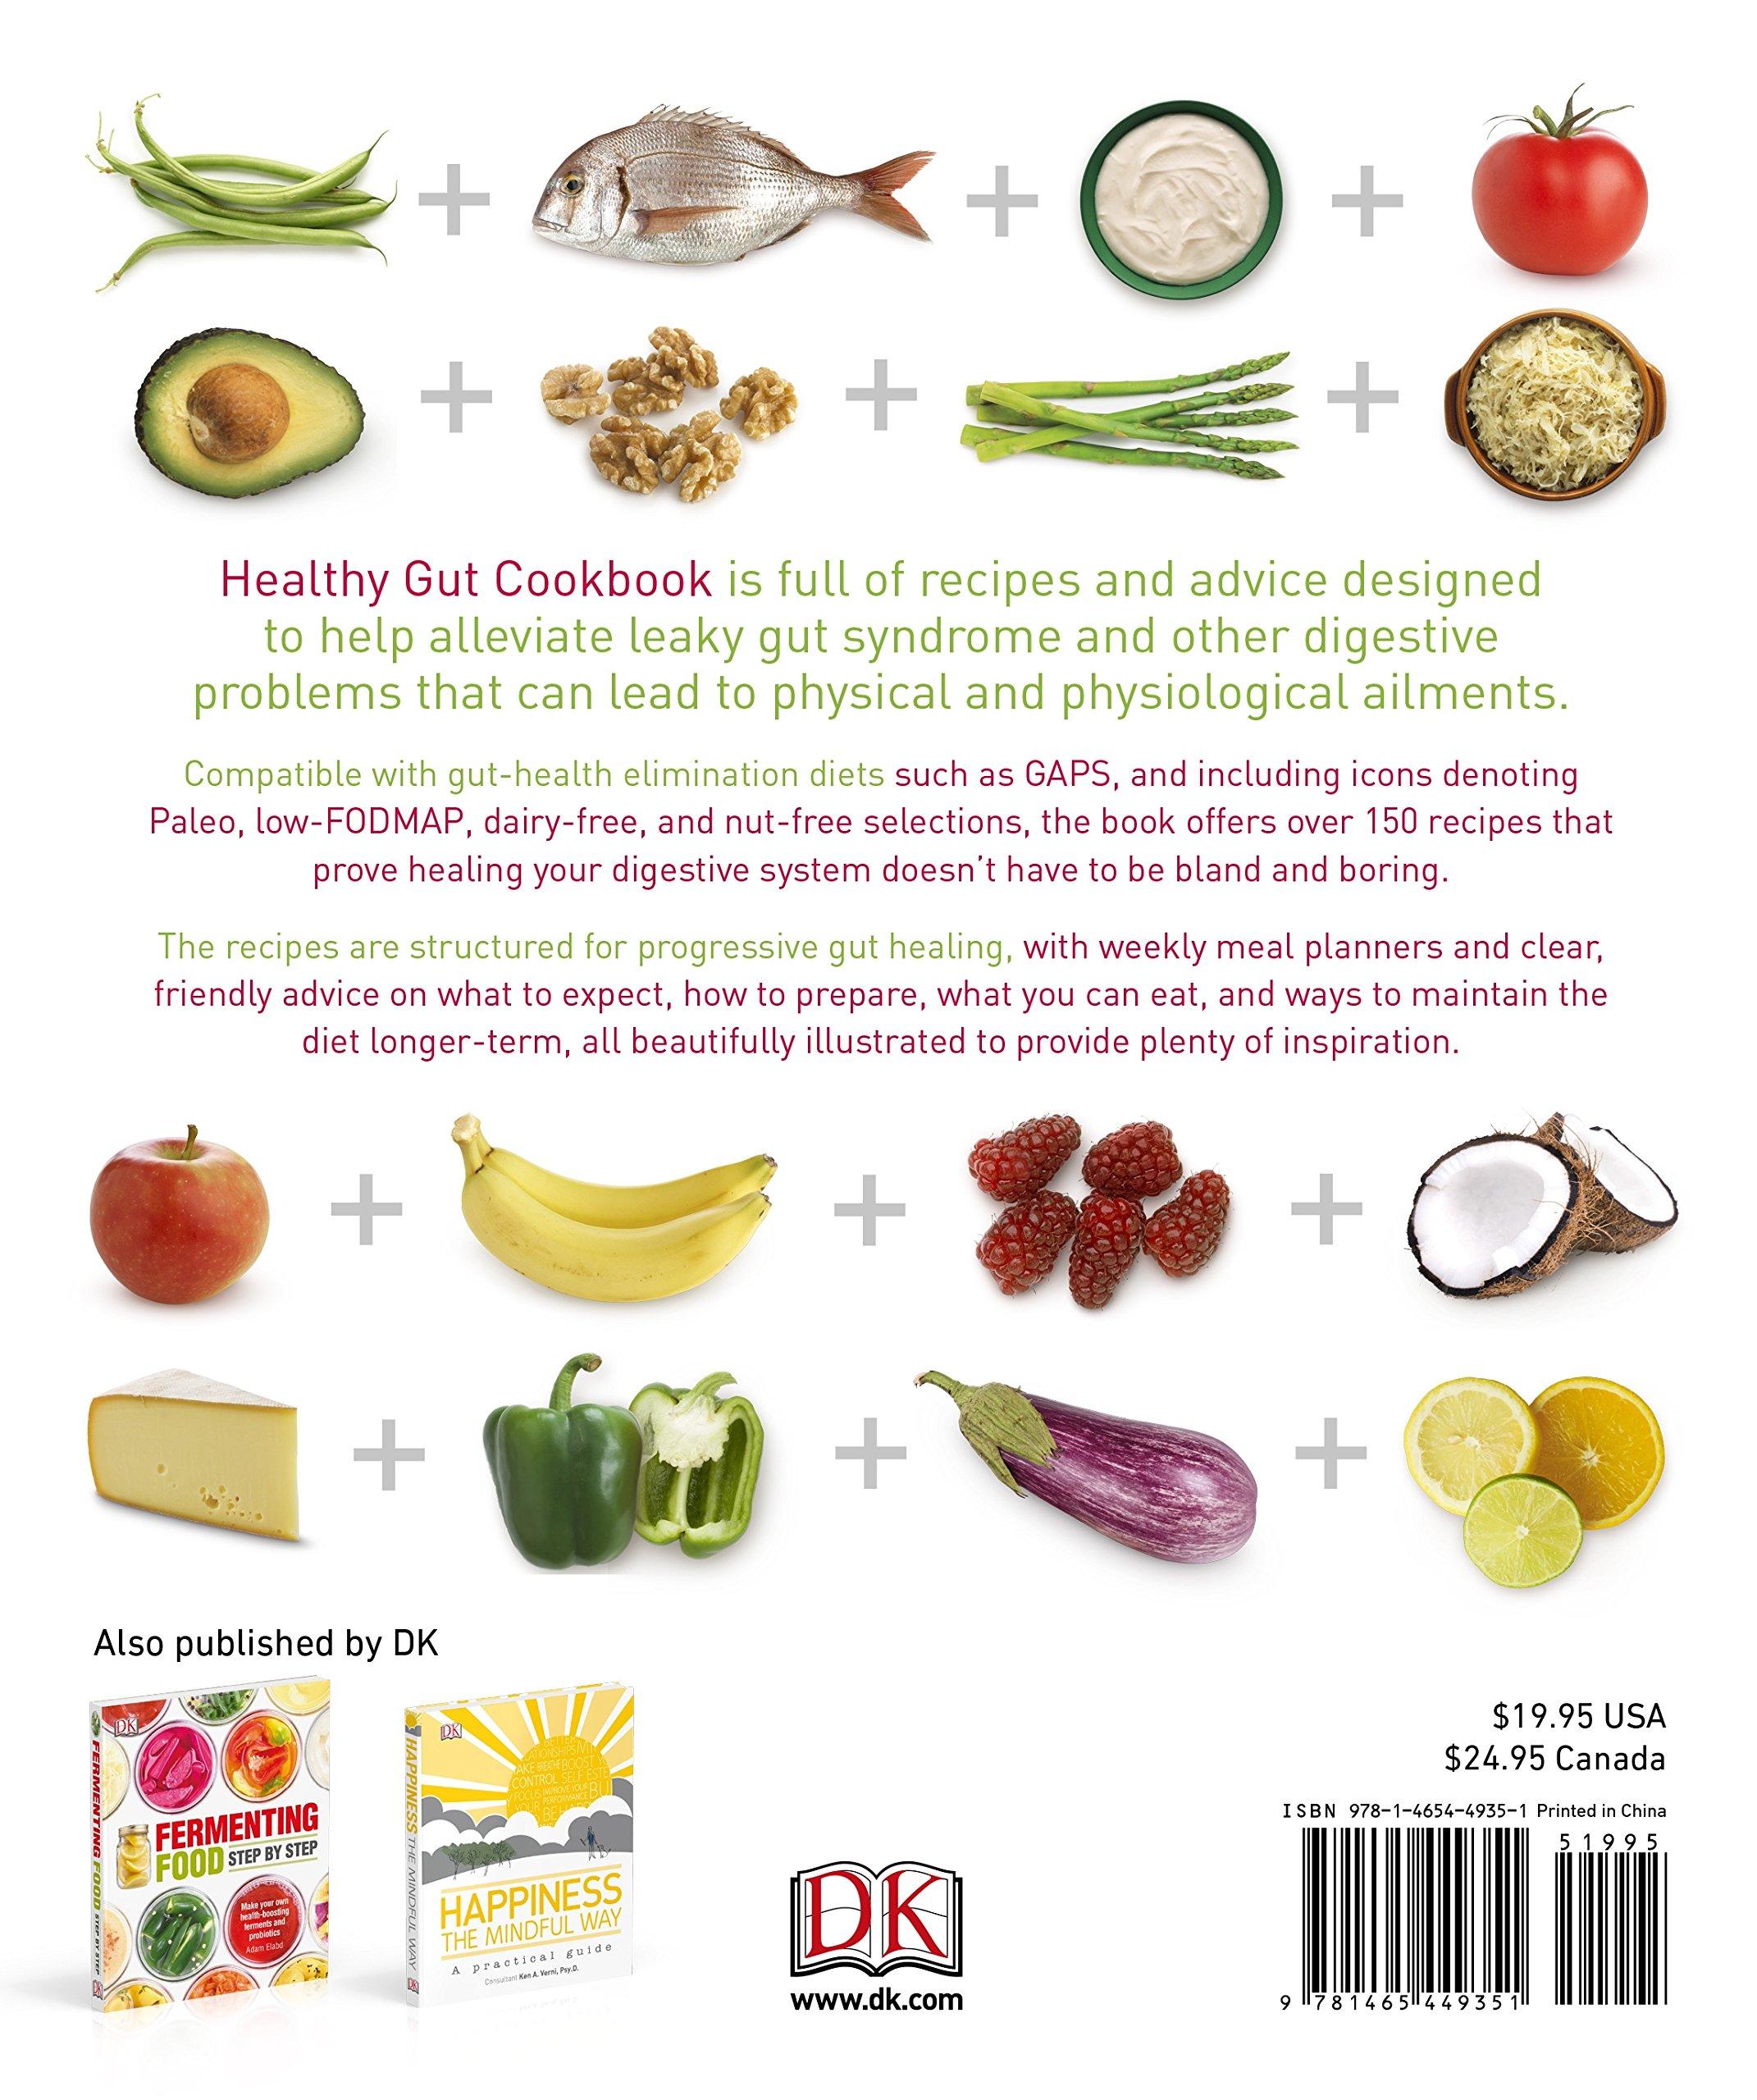 Healthy gut cookbook 150 stage by stage healing recipes to improve healthy gut cookbook 150 stage by stage healing recipes to improve your digestive health amazon gavin pritchard maya gangadharan 9781465449351 forumfinder Images